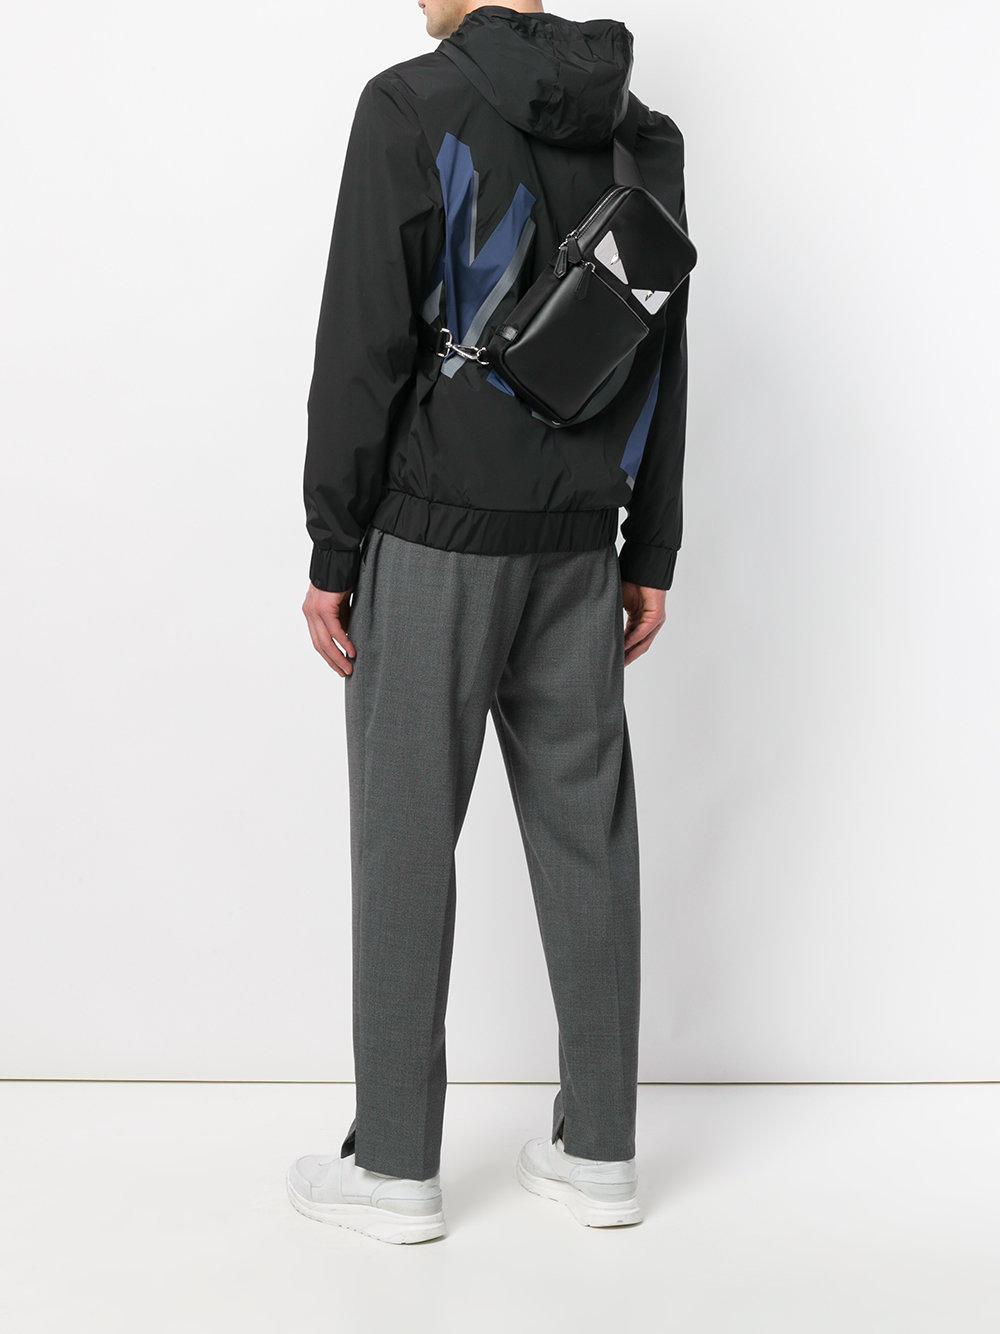 a2a6abb232fa Lyst - Fendi Bag Bugs-eyes Backpack in Black for Men